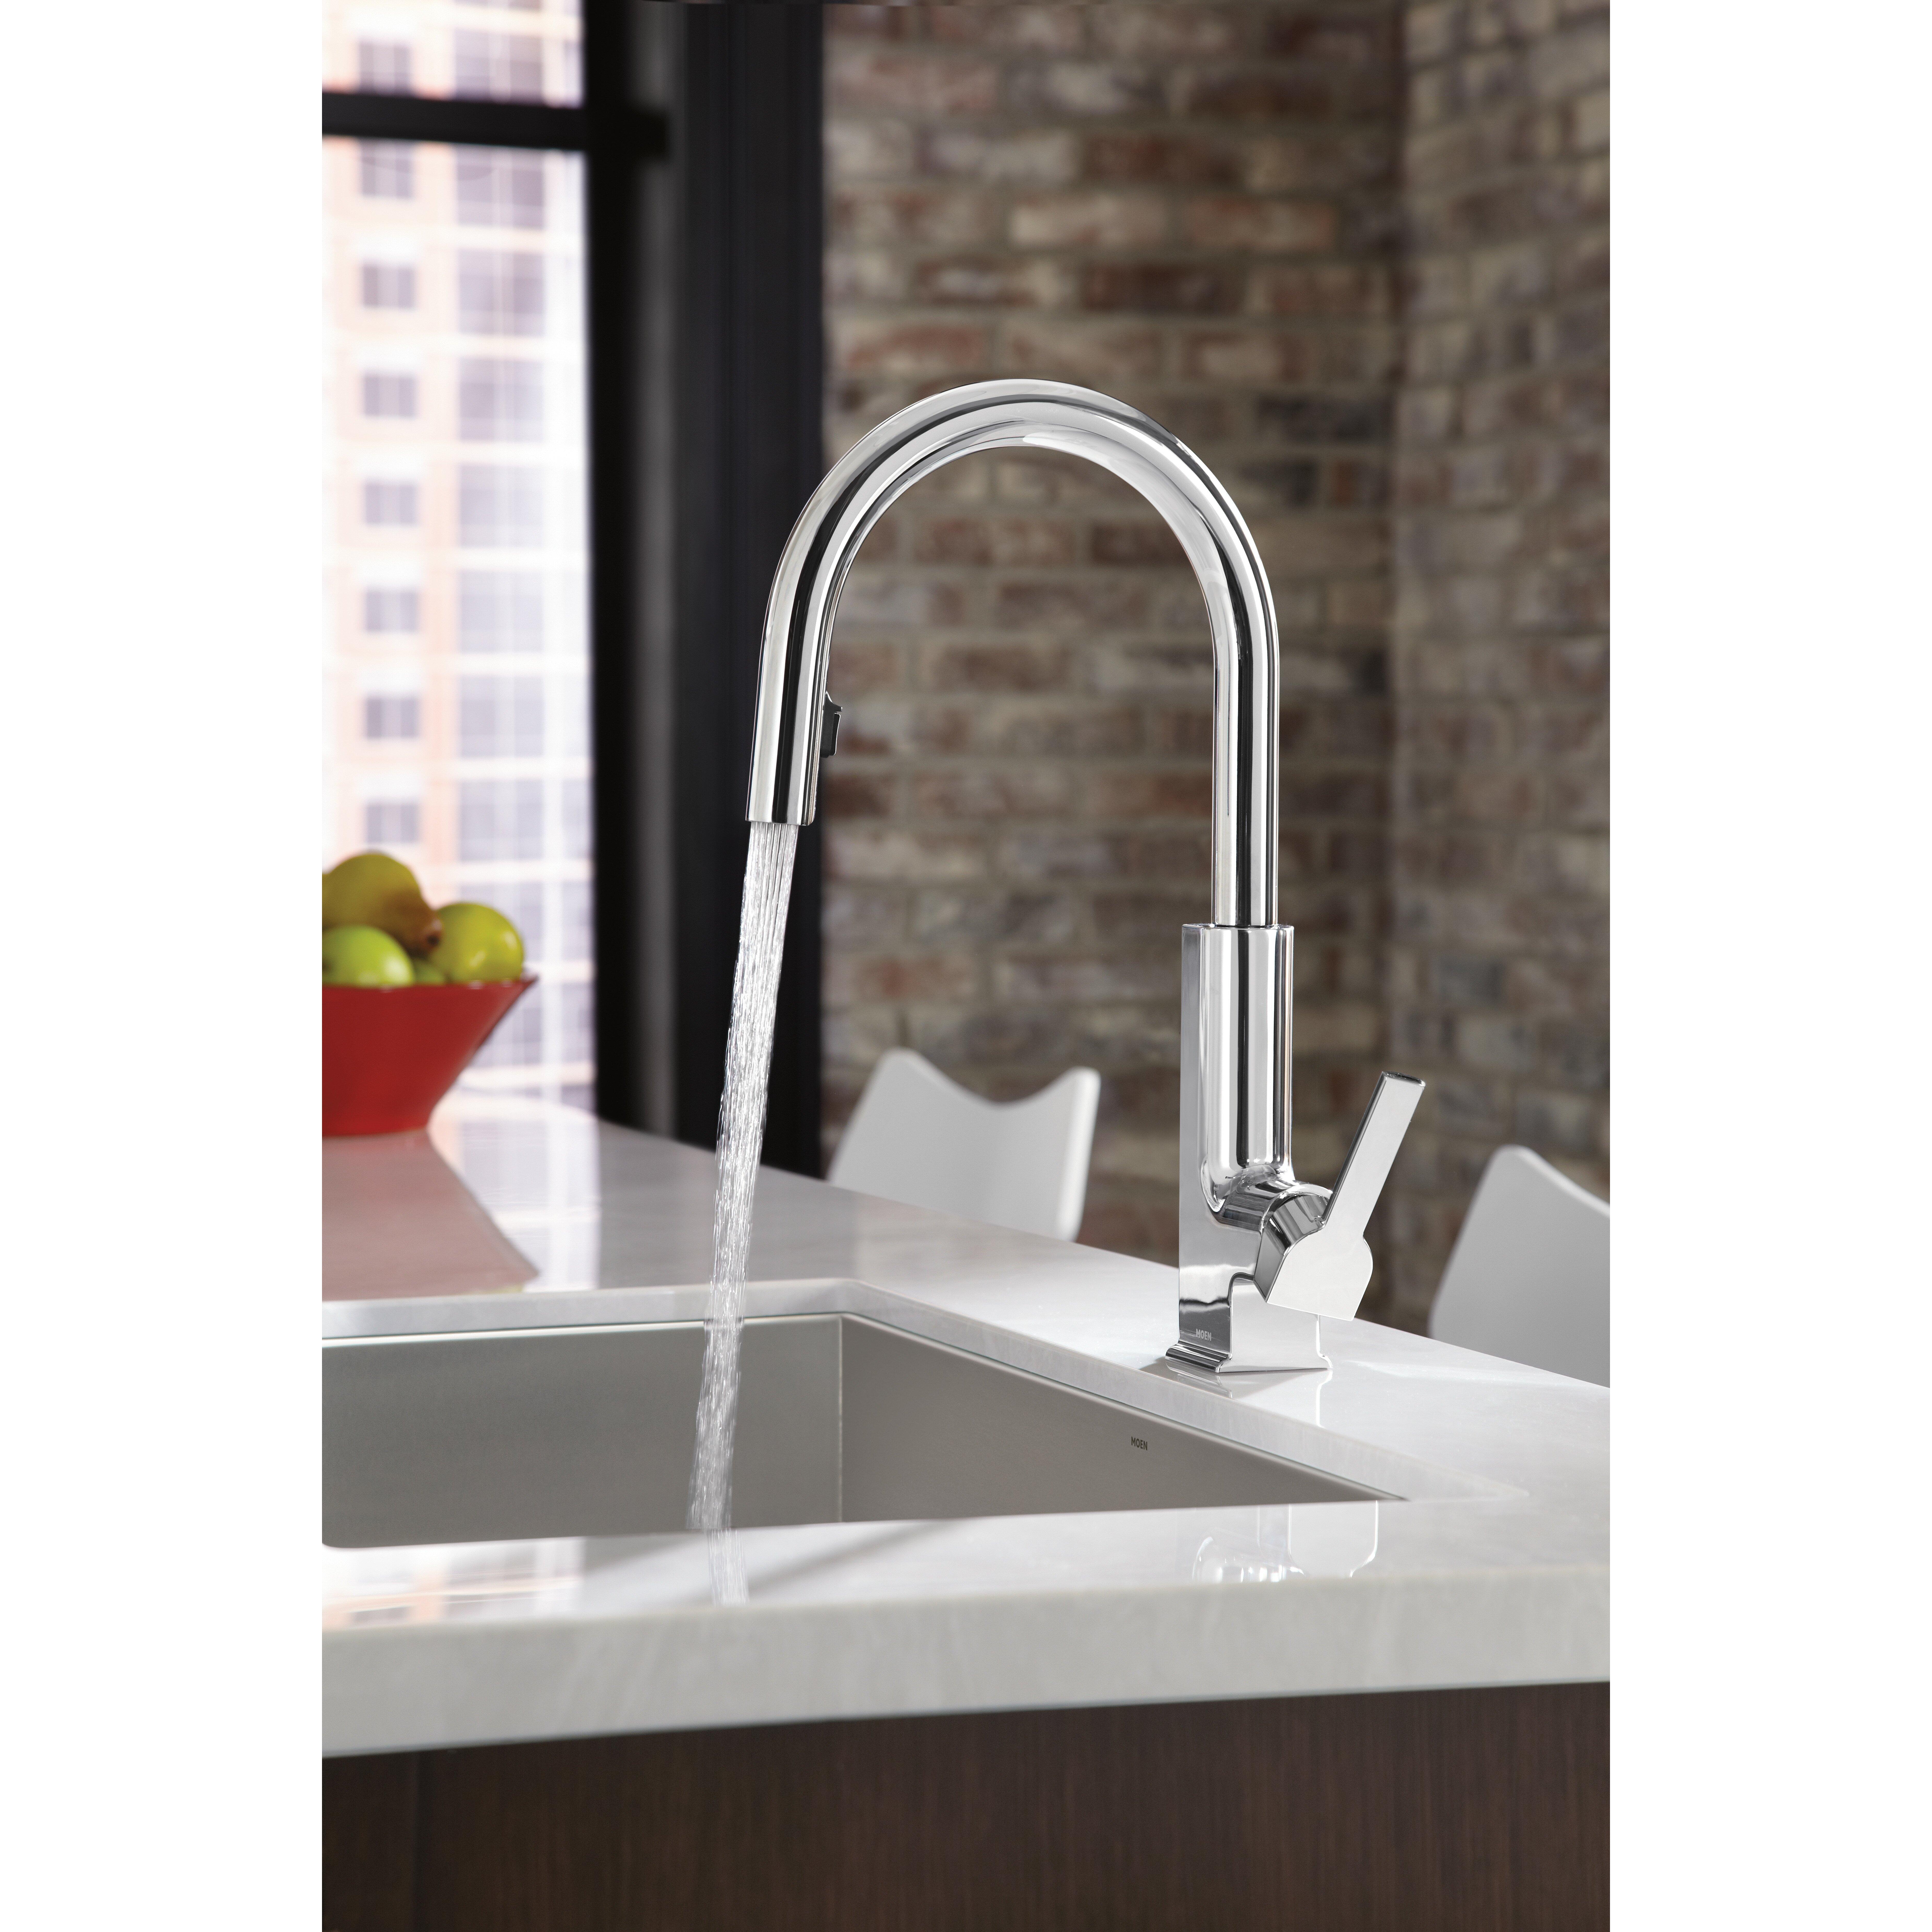 Moen Legend Kitchen Faucet Kitchen Faucet Moen Moen Wall Mount Kitchen Faucet Cleandus